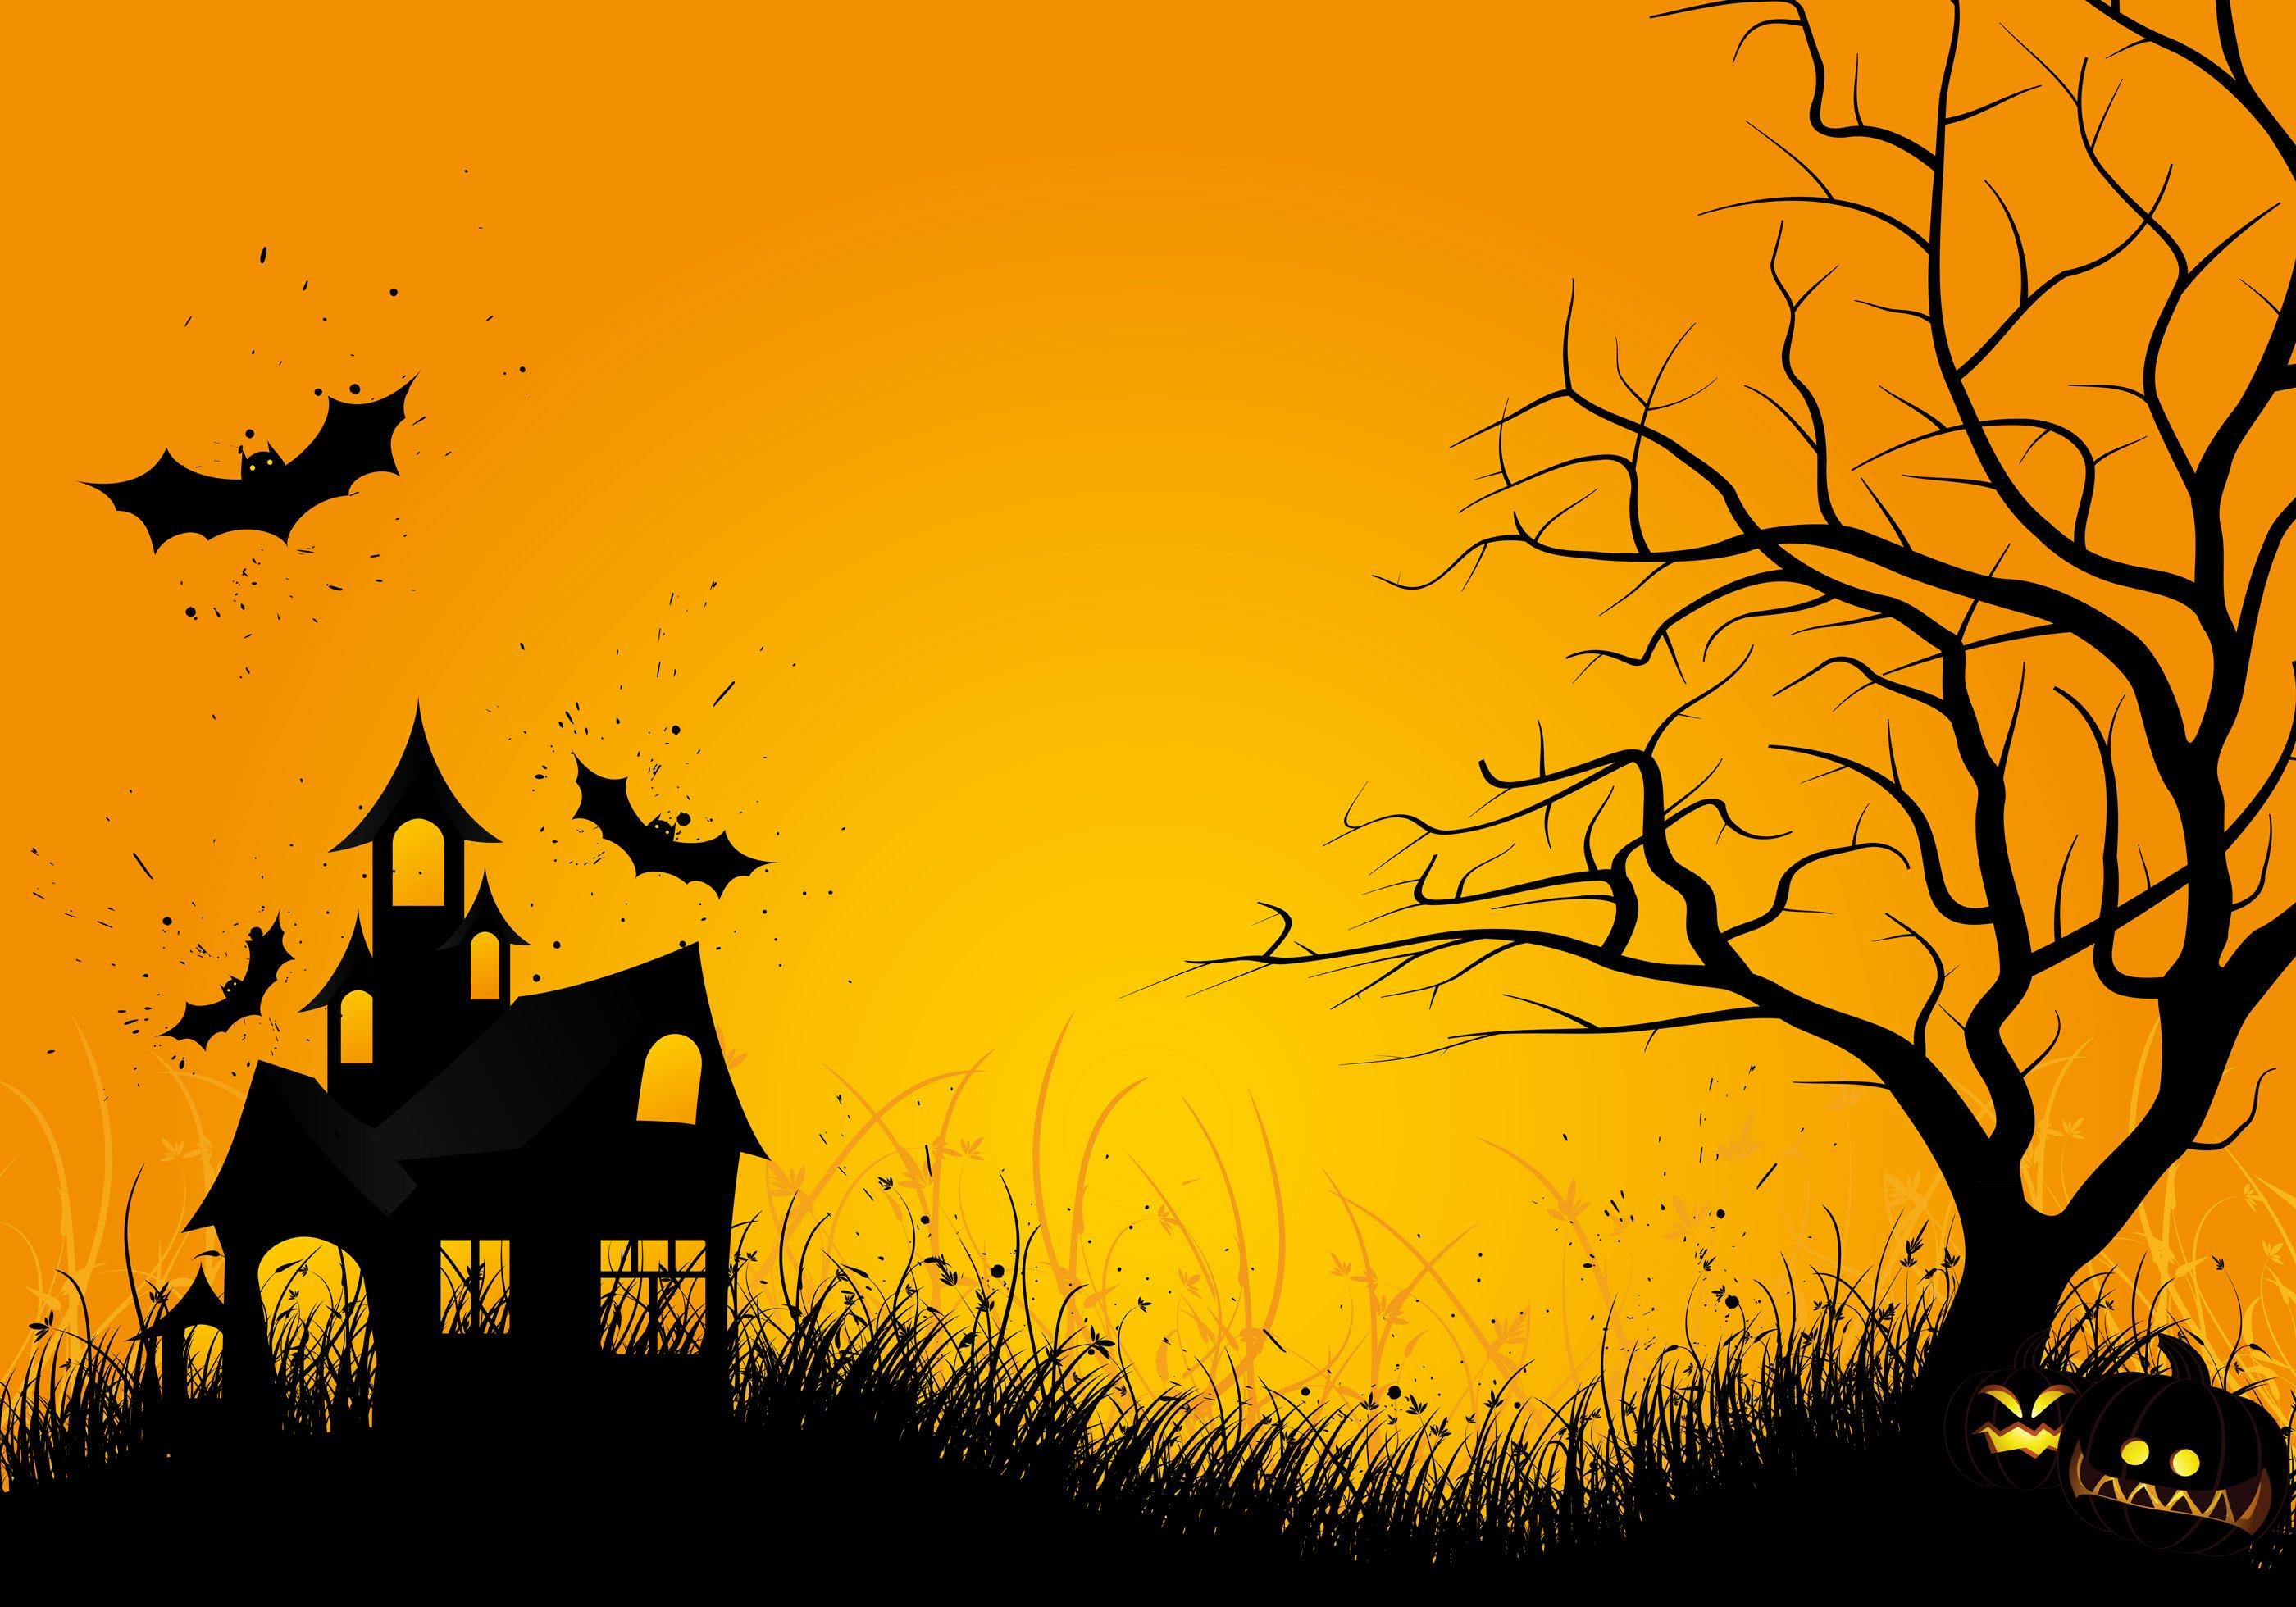 Backdrop Halloween House  3m x 2.3m $60 Incl frame & gst